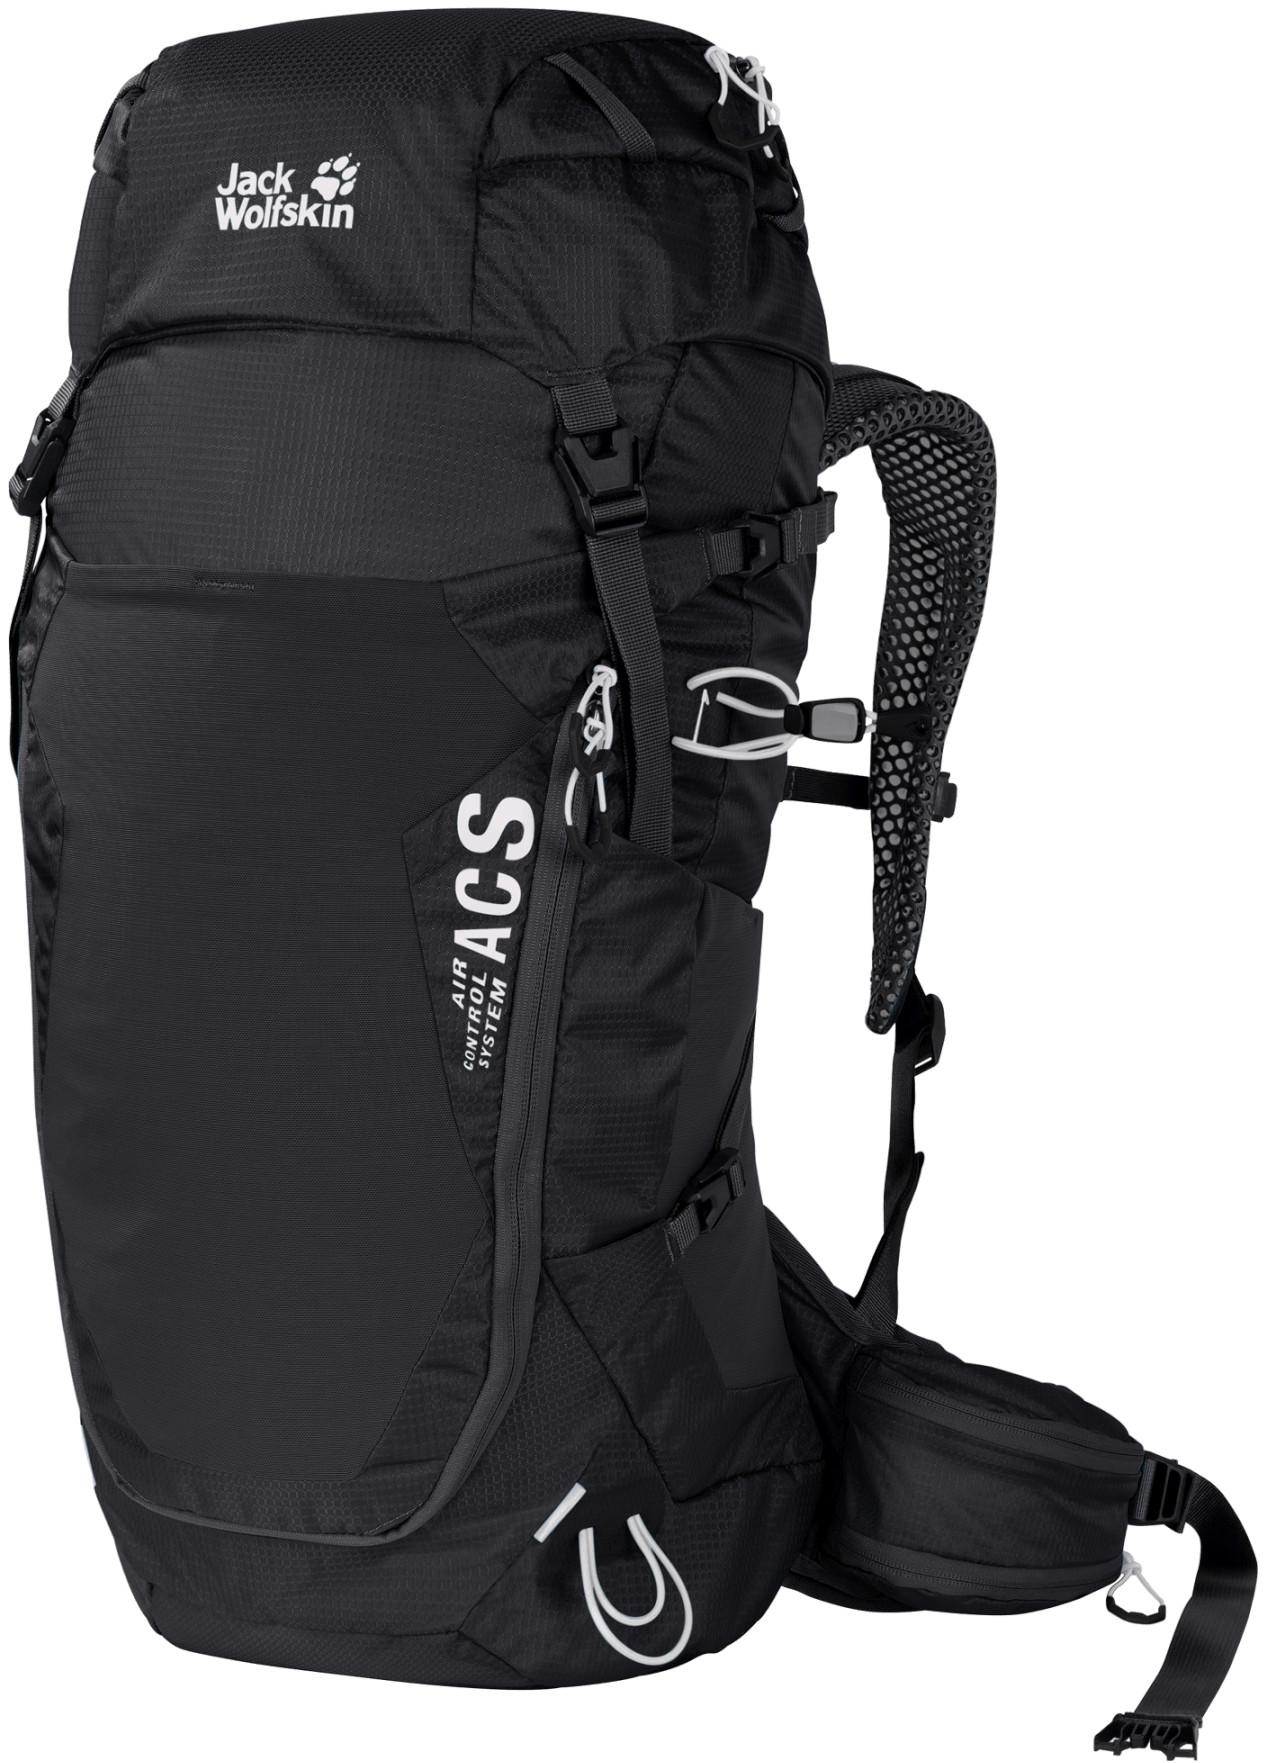 Jack Wolfskin Plecak turystyczny CROSSTRAIL 30 ST black